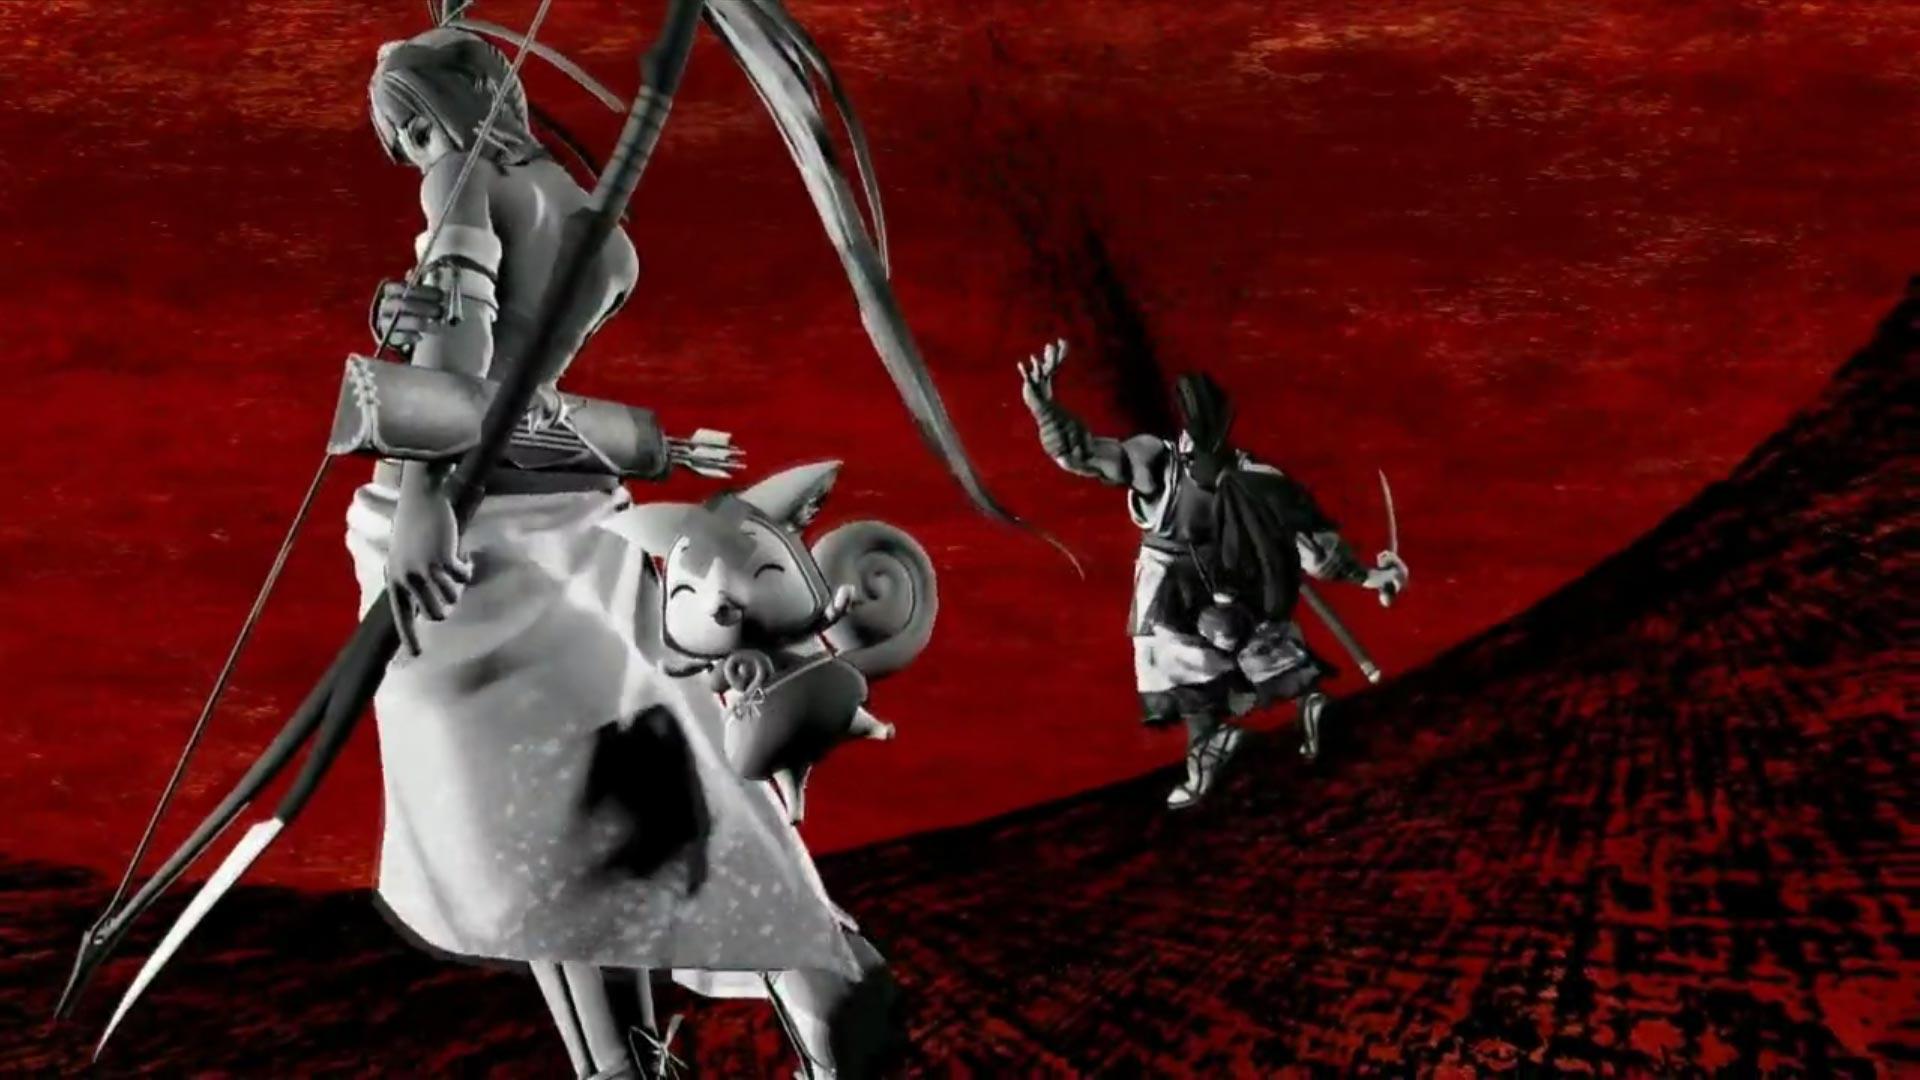 Samurai Shodown Season 2 Trailer Image Gallery 2 out of 9 image gallery